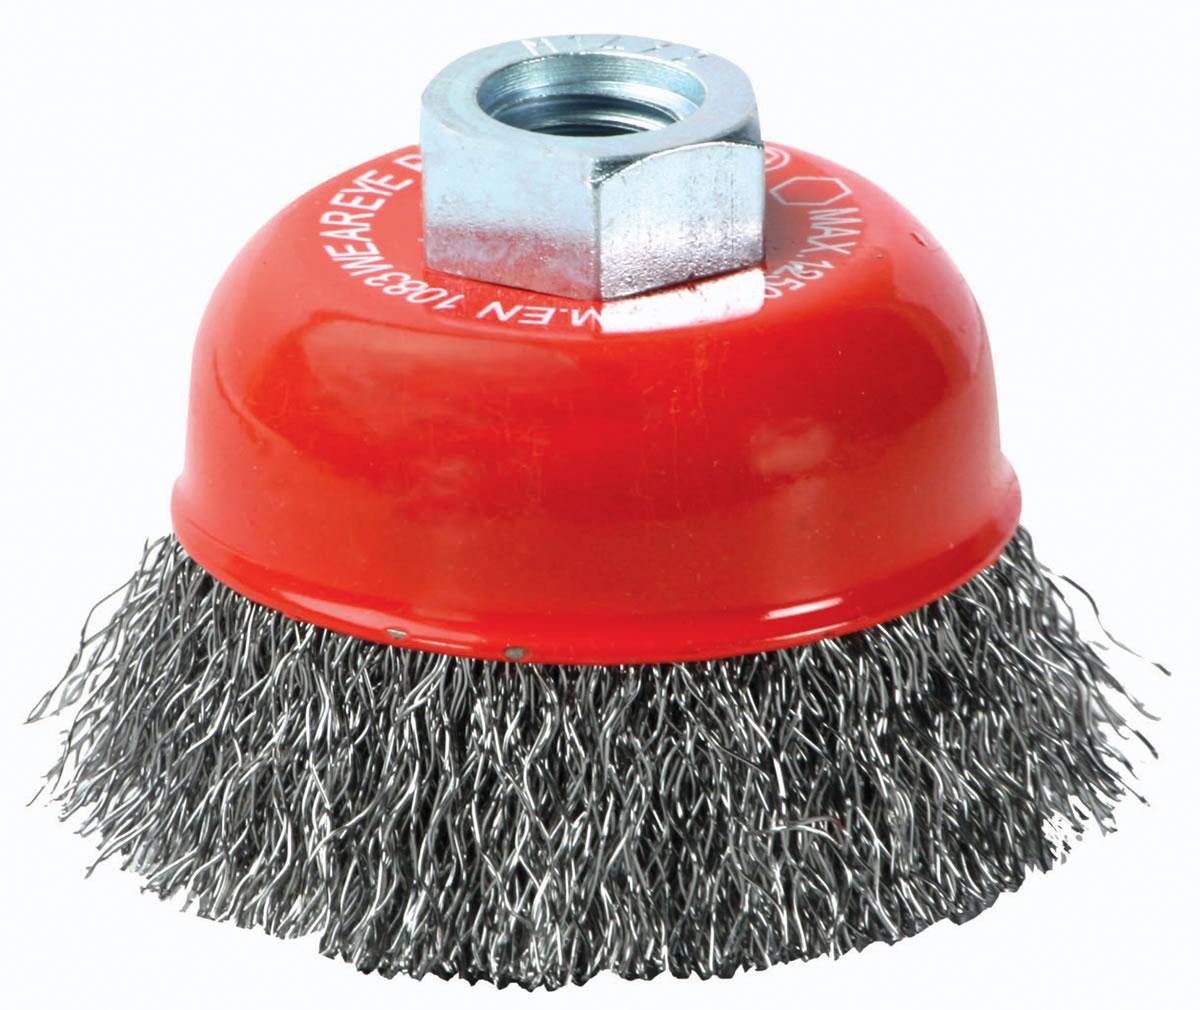 Escova de Aço Copo  - OSBORN